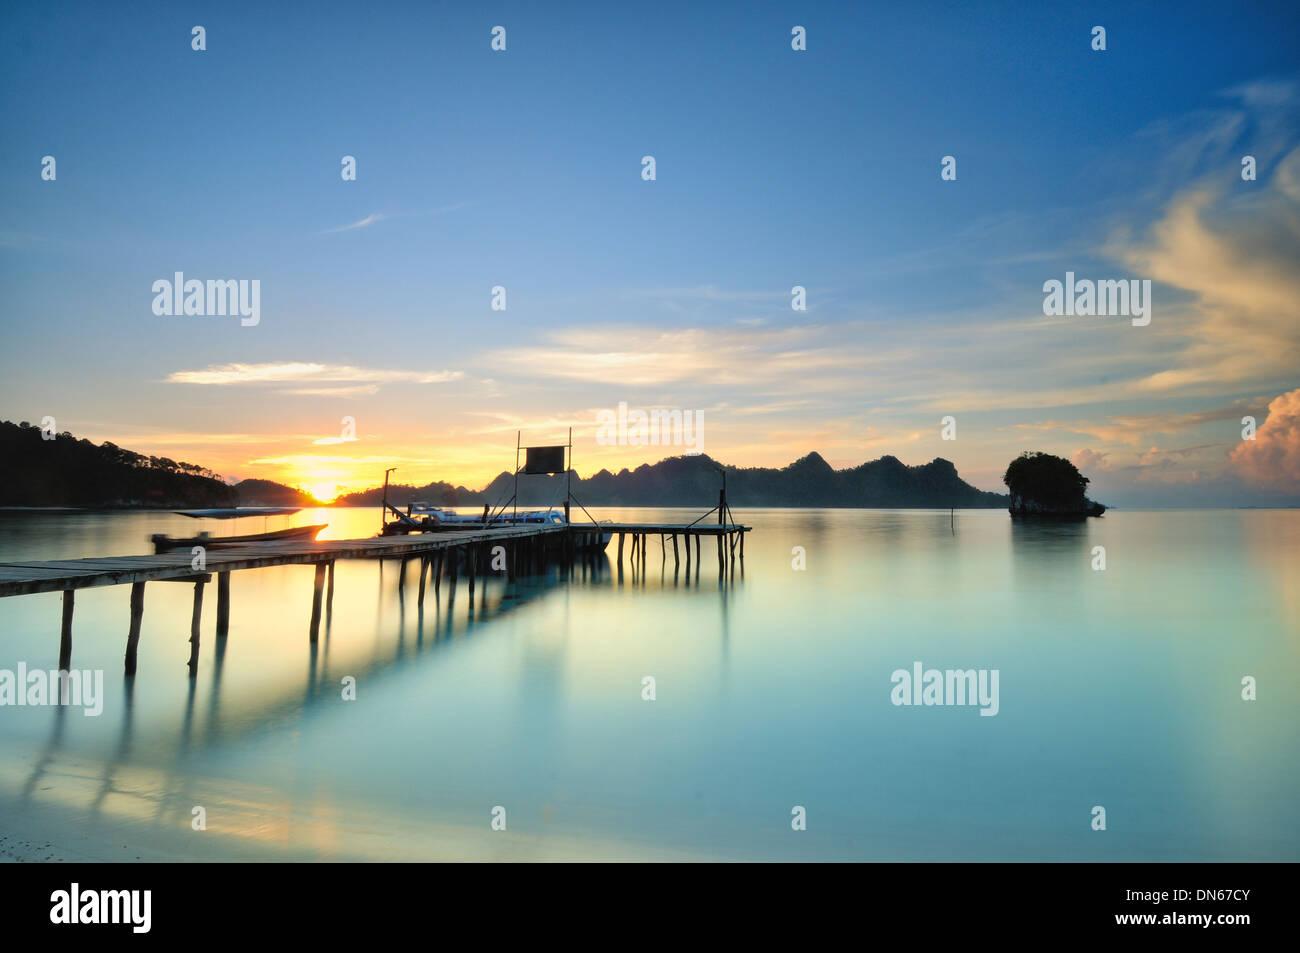 Sunrise at Wayag port, Raja Ampat - Stock Image